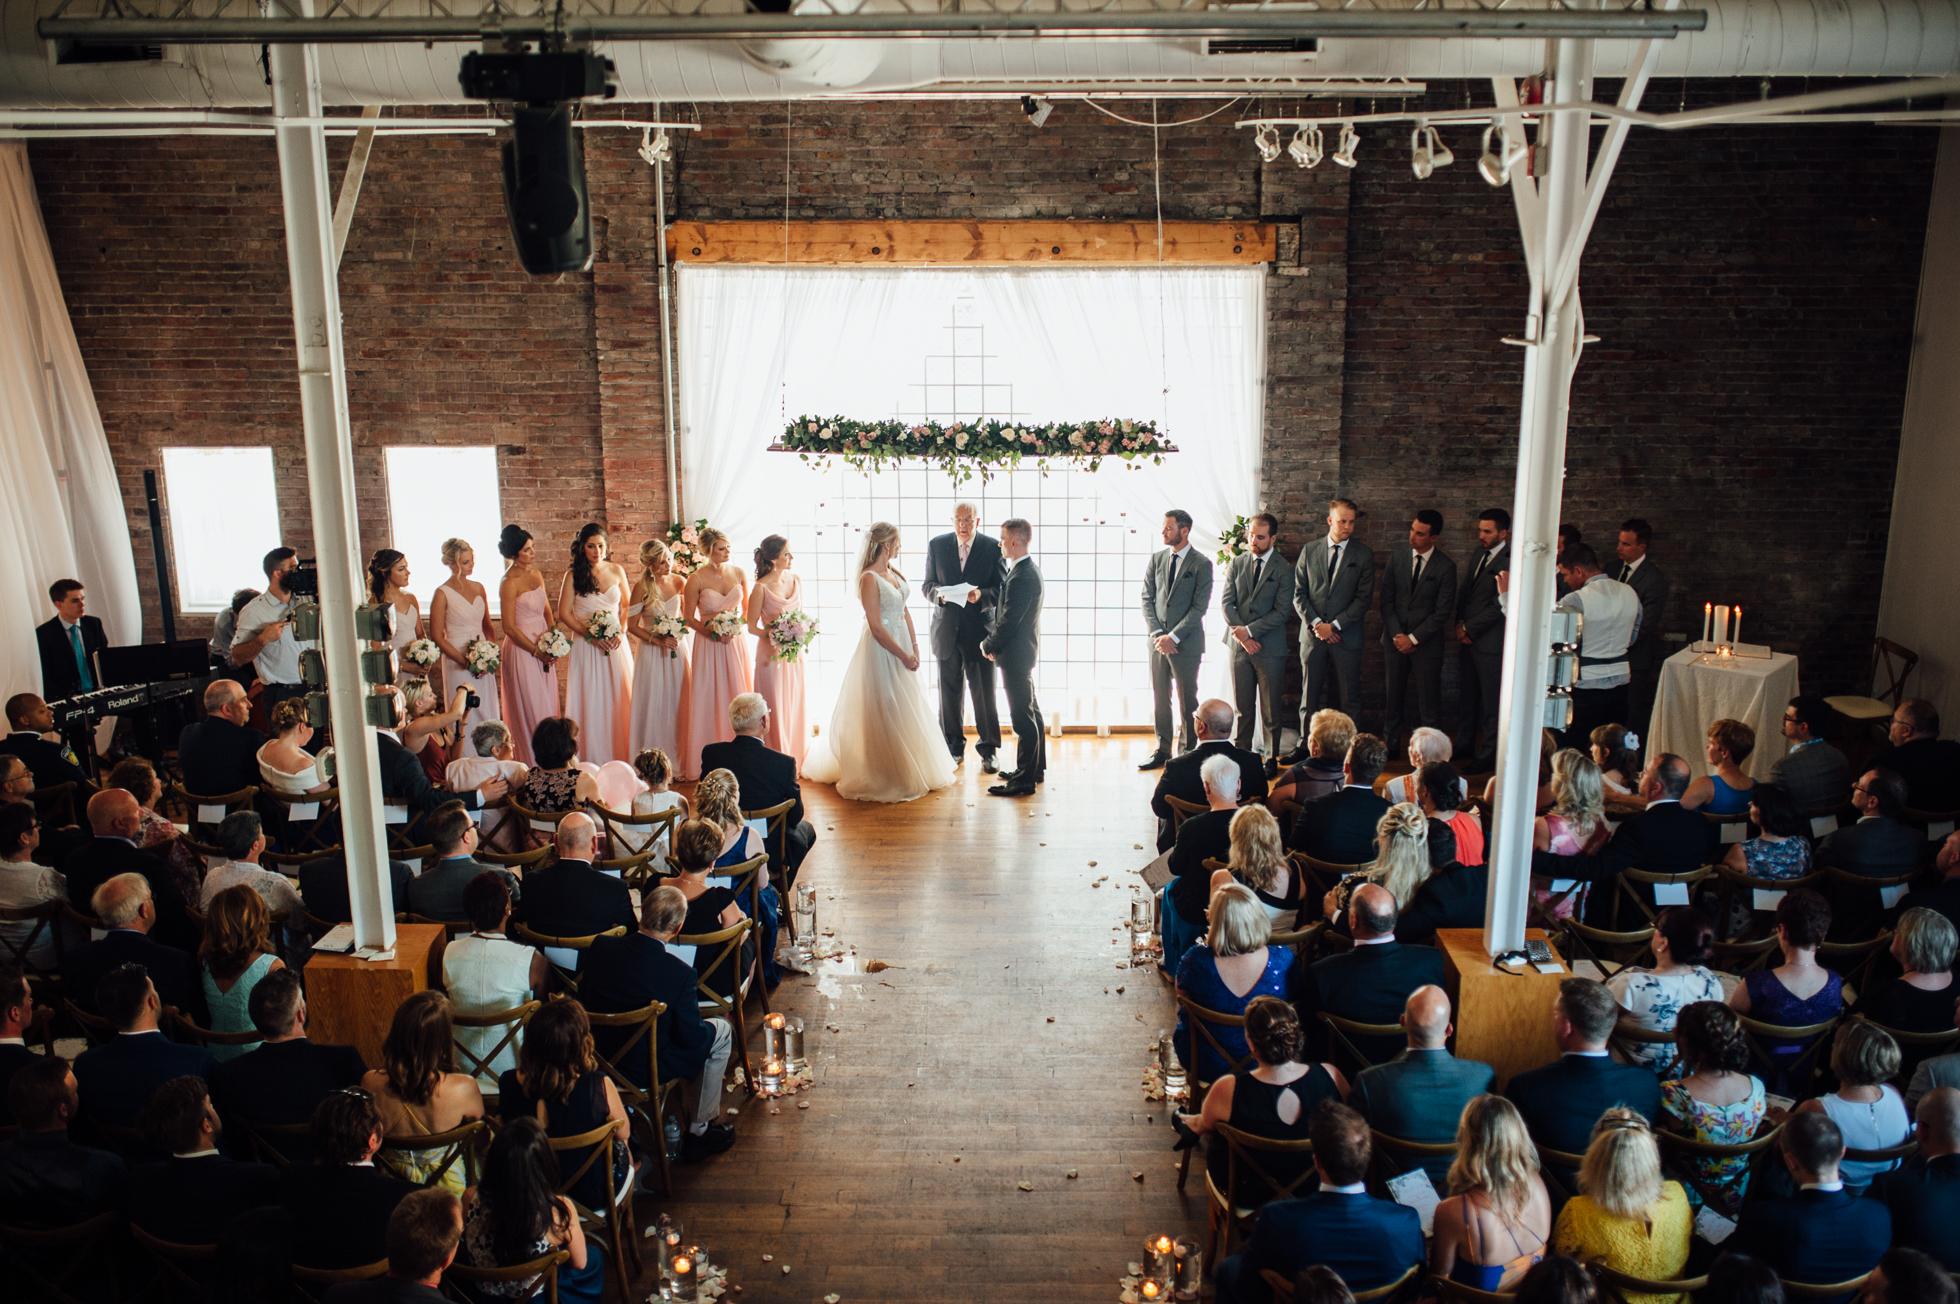 99-Sudbury-Toronto-Wedding-Photography-19.jpg